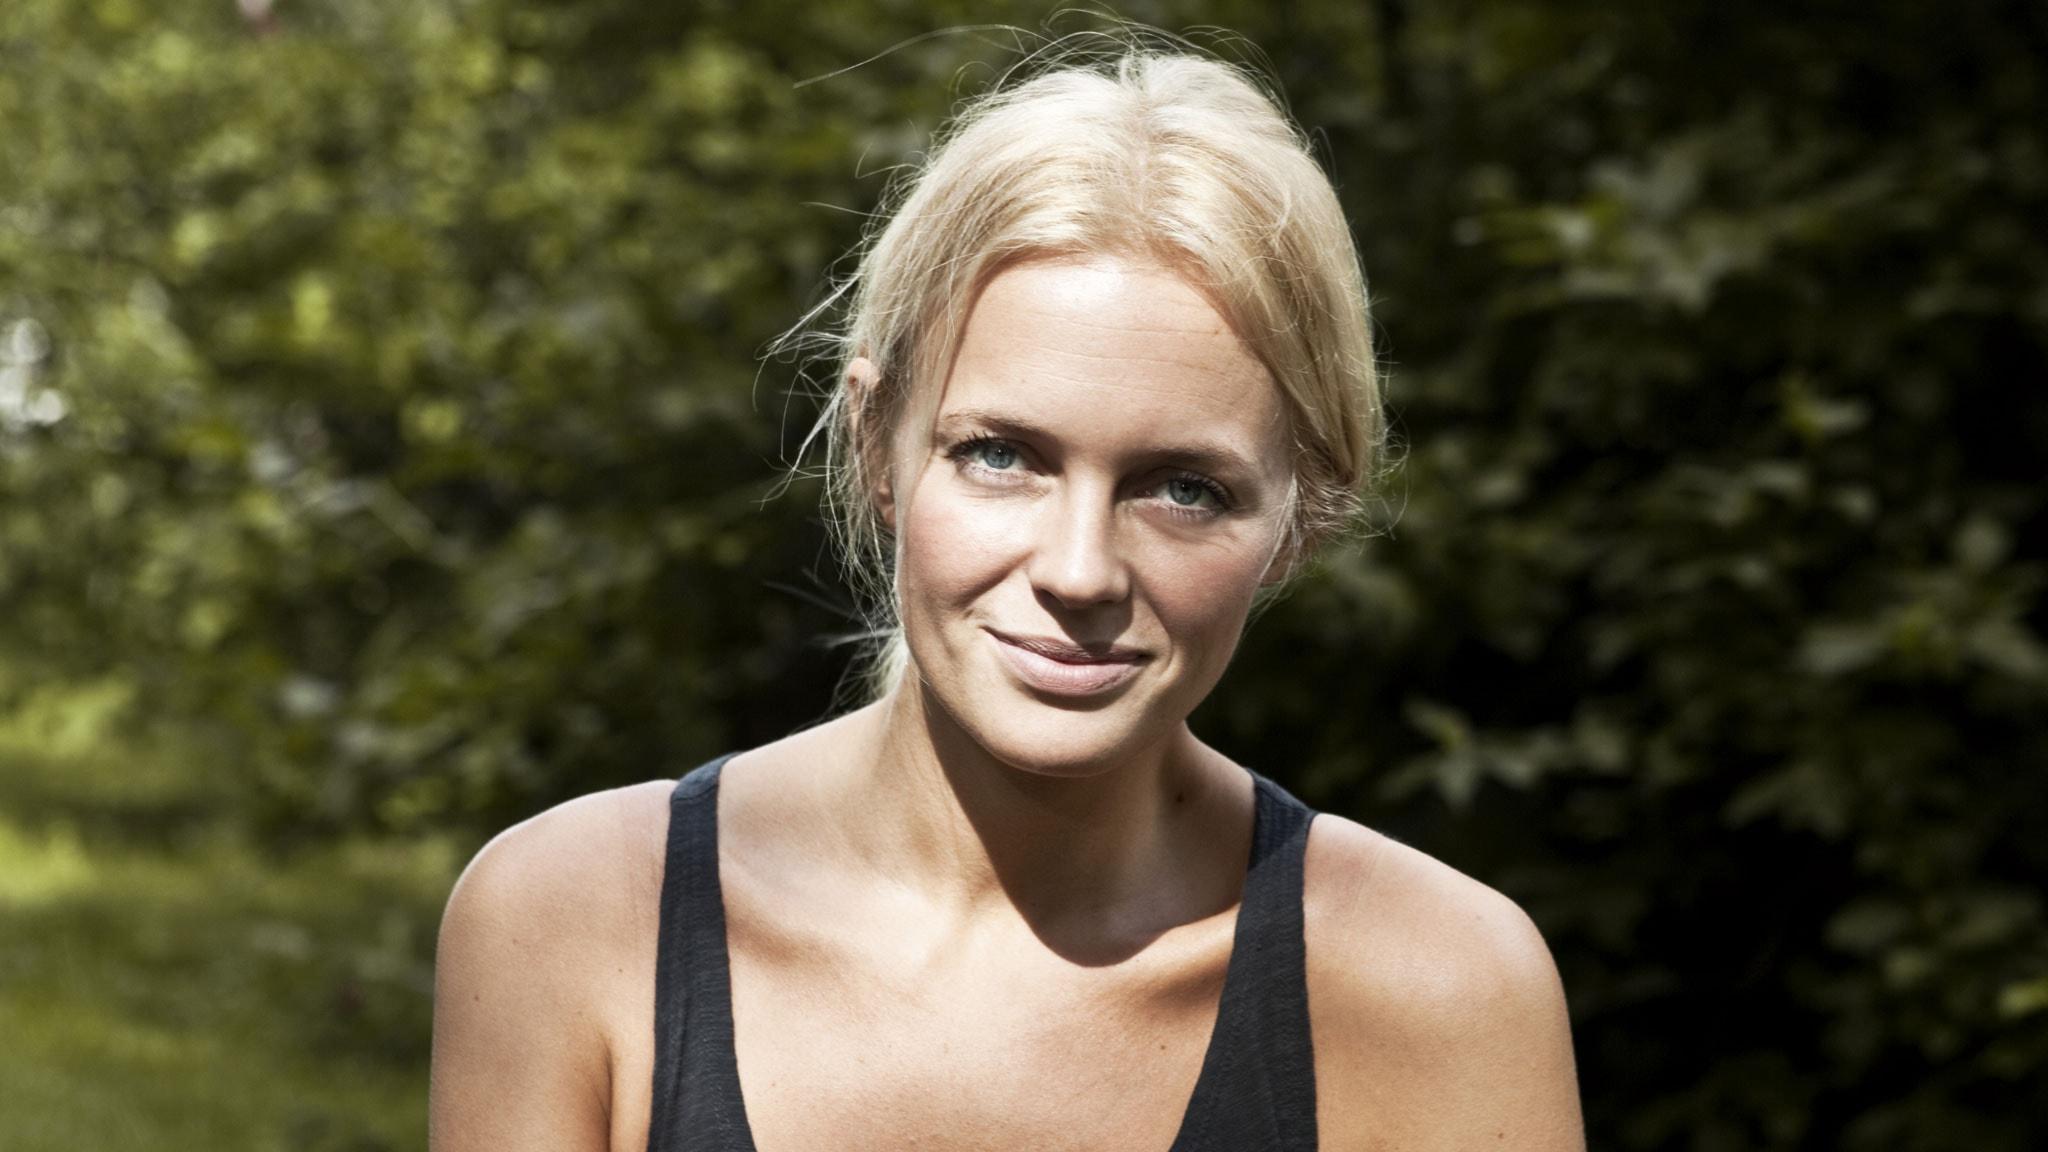 Josephine bornebusch 21 augusti 2010 kl 13 00 sommar vinter i p1 sveriges radio - Josephine tv ...